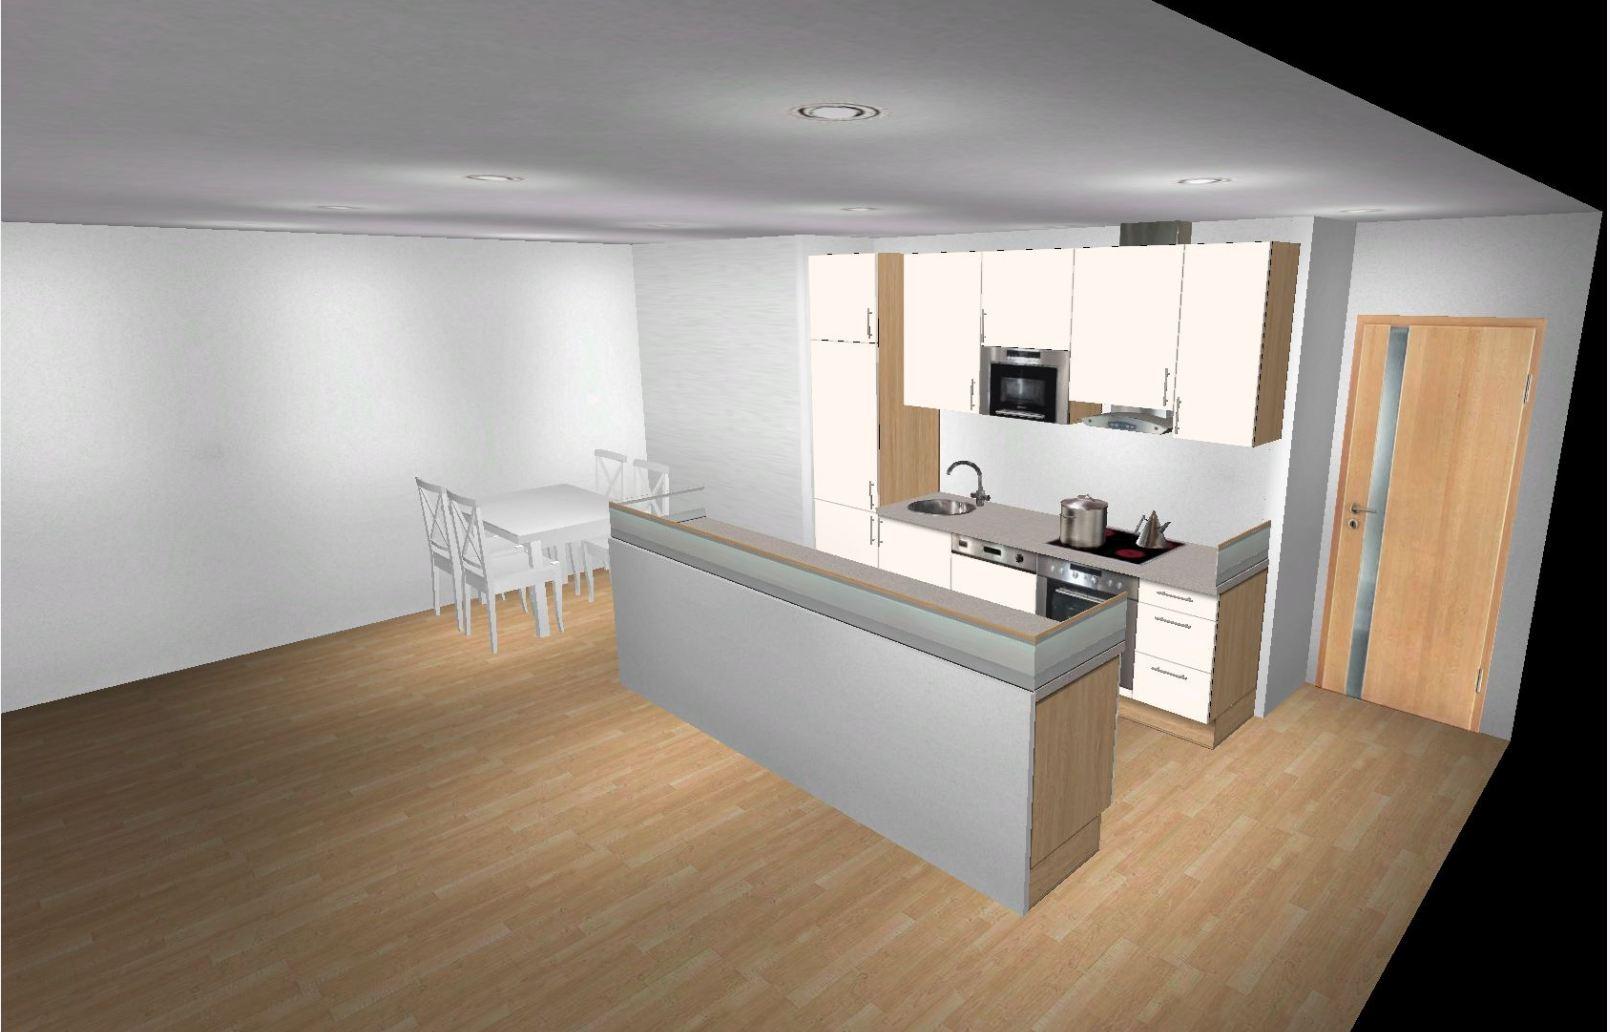 Beleuchtung Kücheninsel Beleuchtung Für Pflanzen Haus Ideen